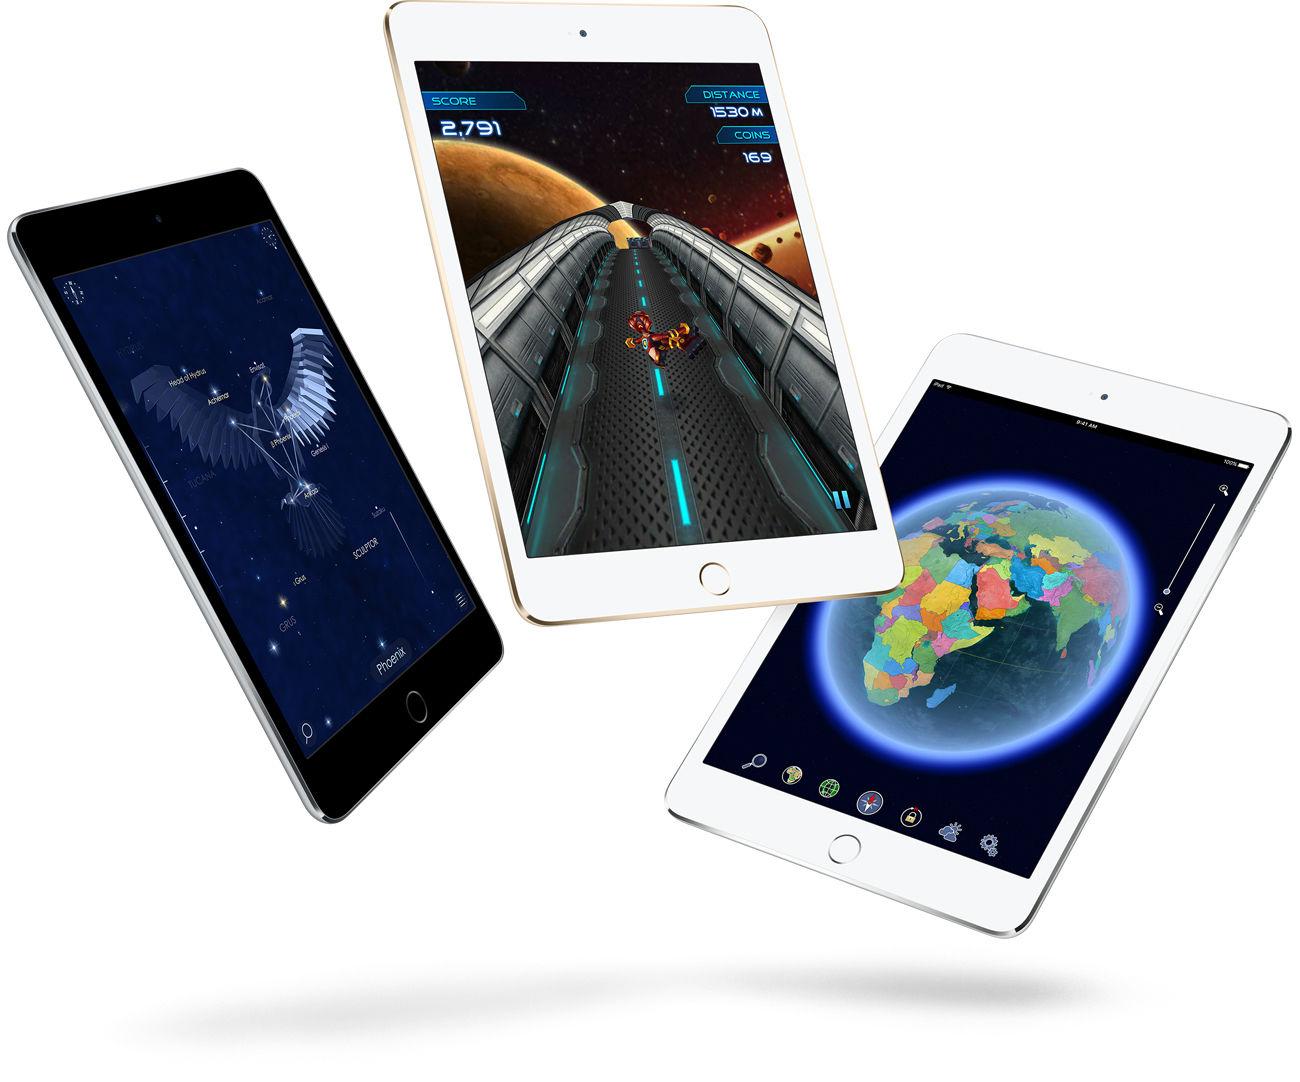 new_web/1445872242316-29761928_6603.jpg